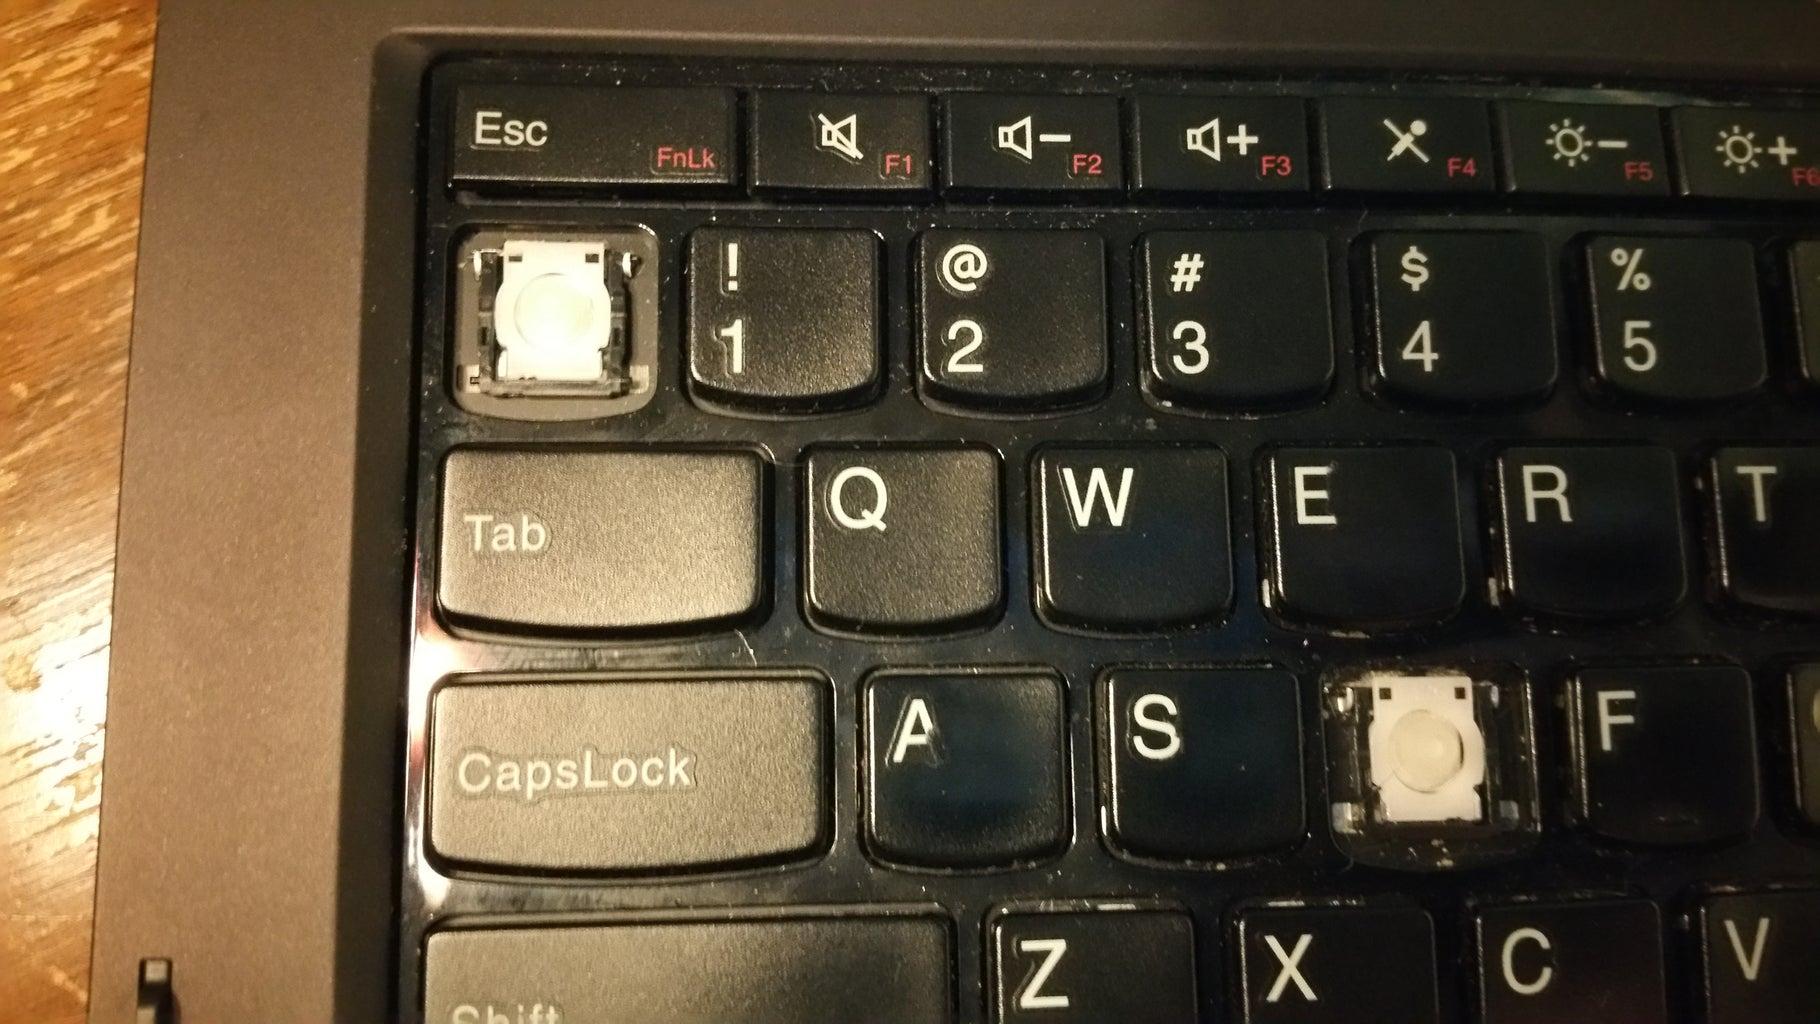 Find a Donor Key Cap